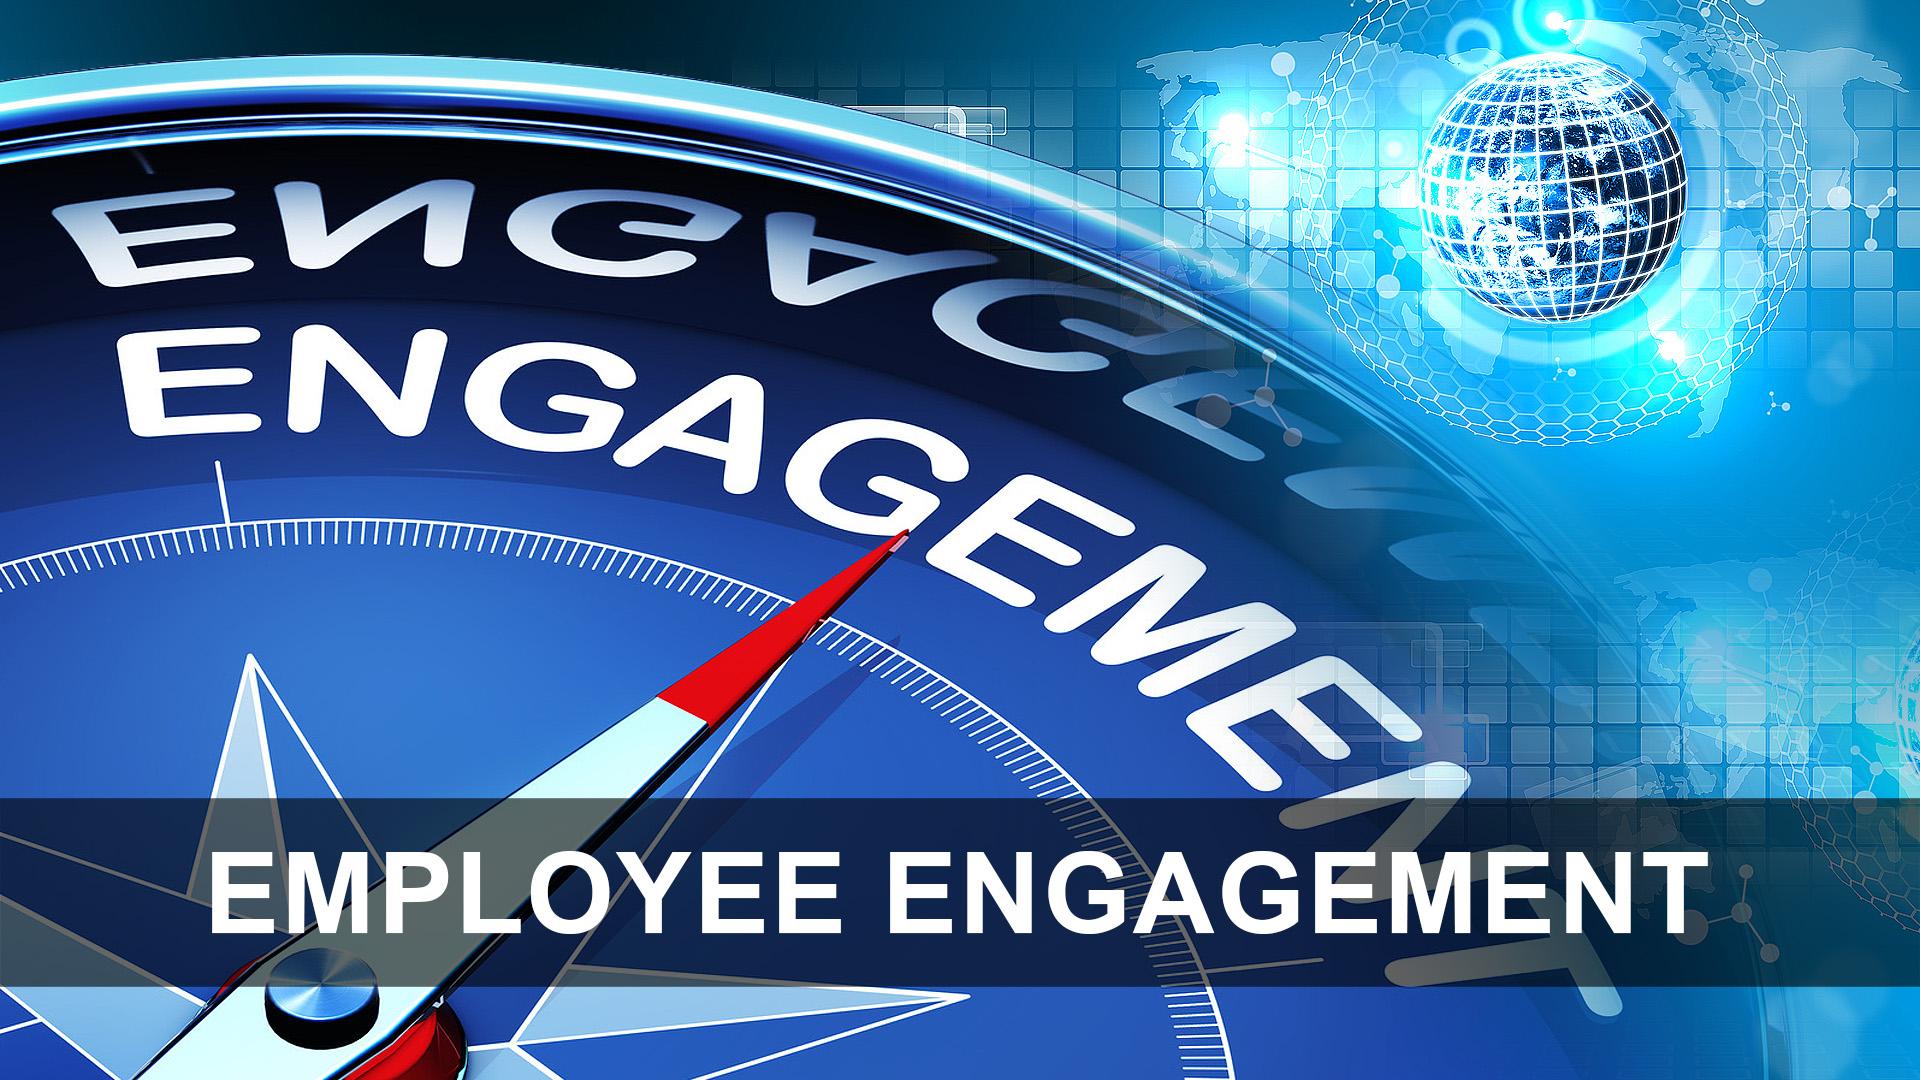 Employee Engagement - KAM.jpg